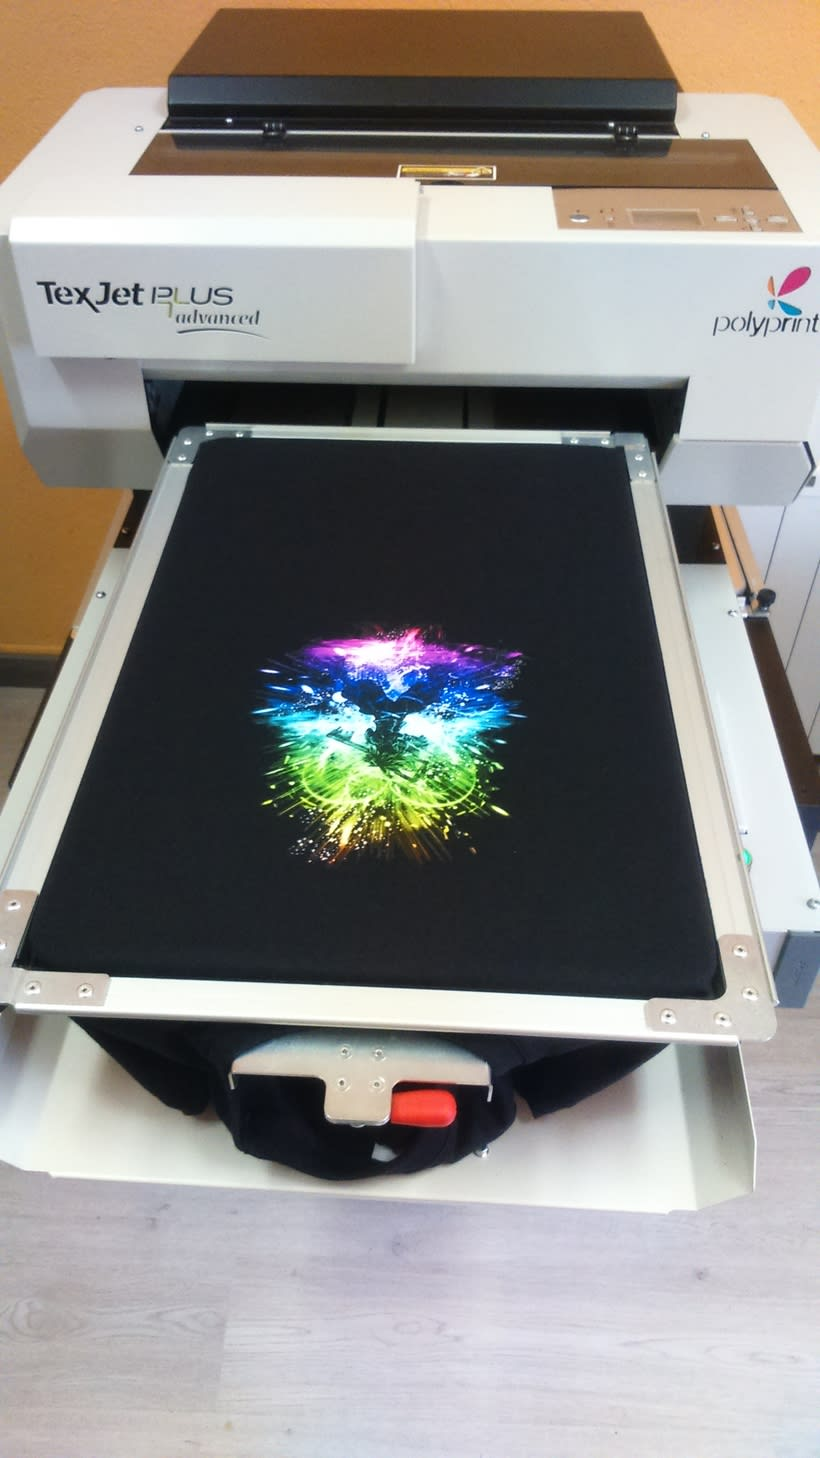 Impresora textil para diseño de camisetas 6